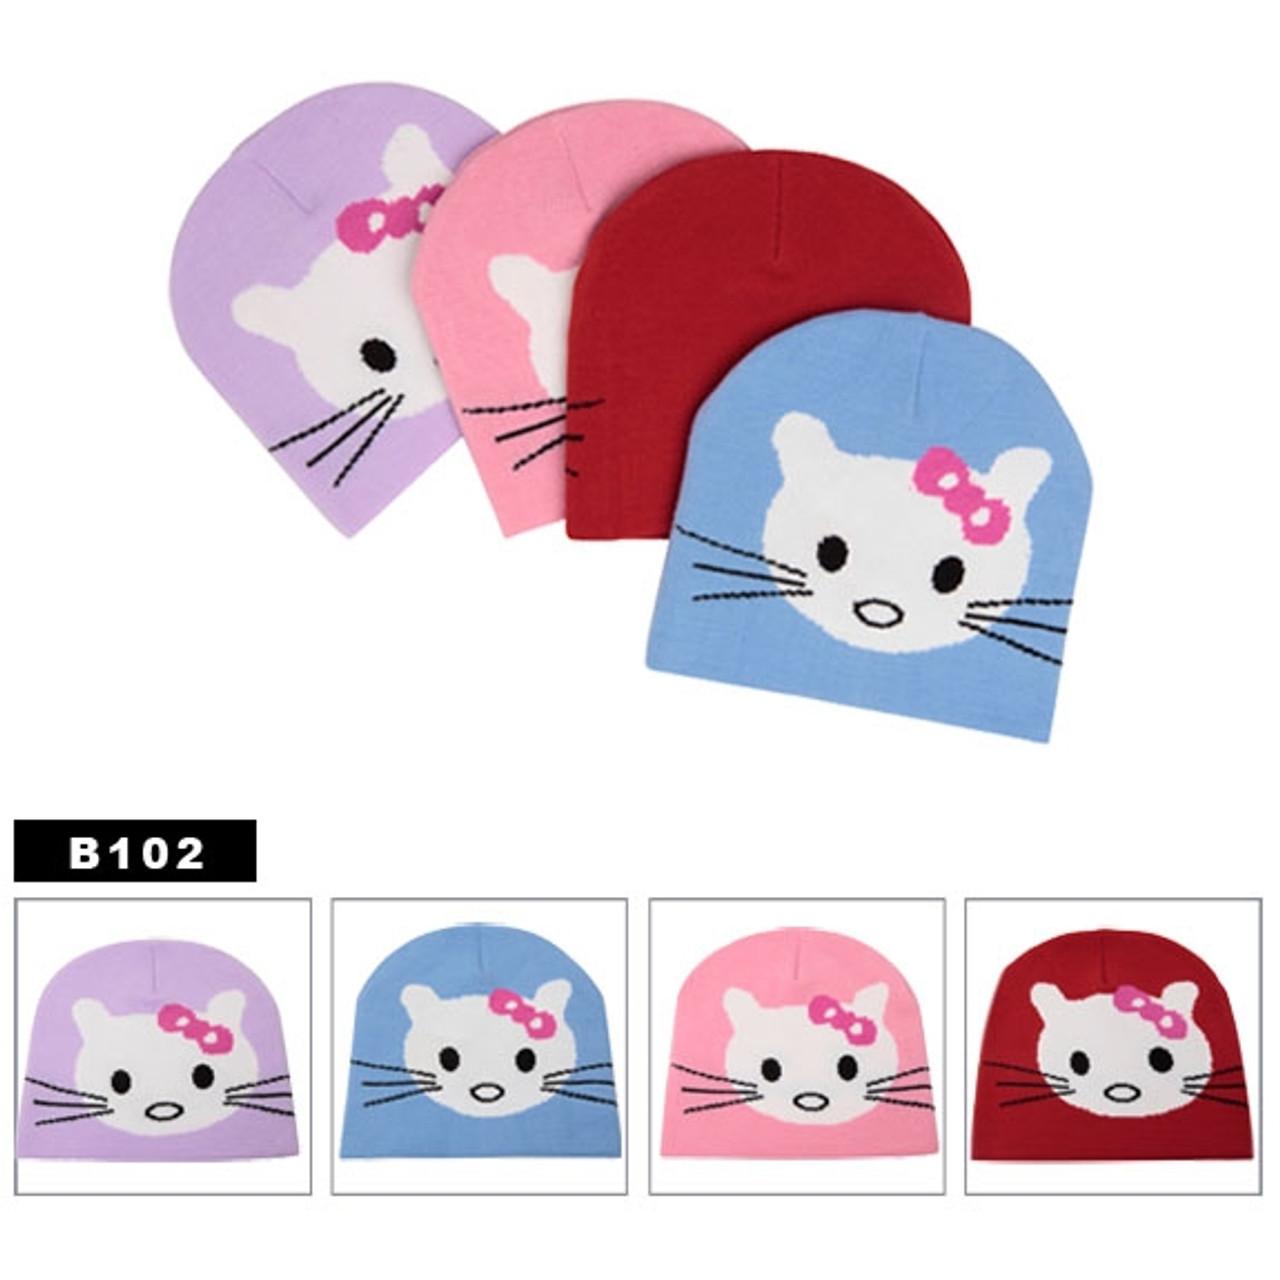 Meow, Meow Cute Kitten Caps.